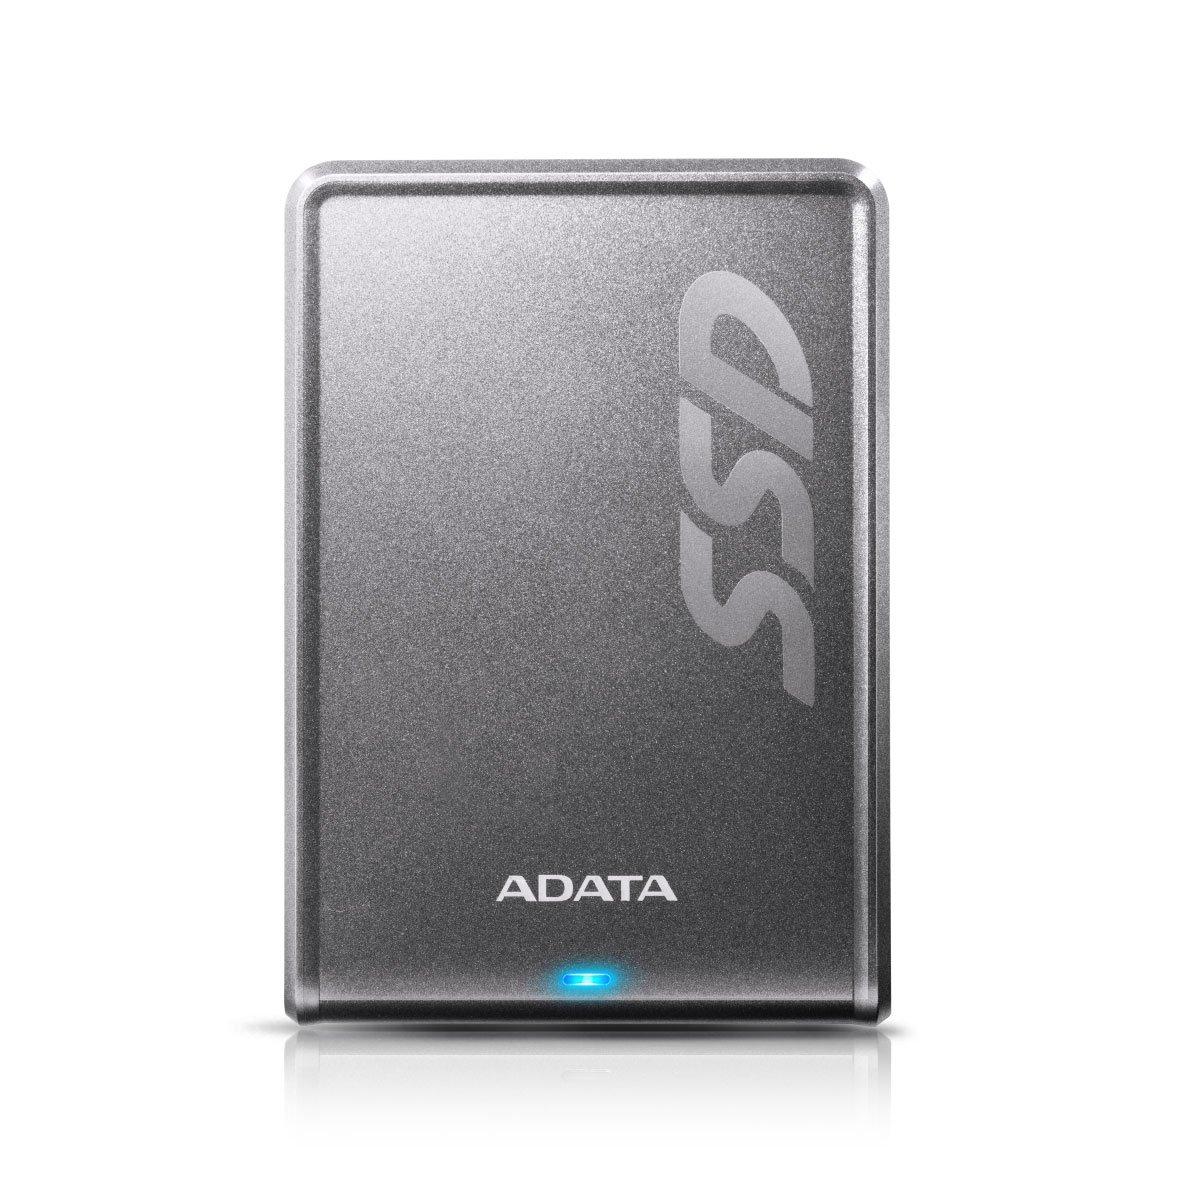 ADATA SV620 480GB USB 3.0 External Solid State Drive (ASV620-480GU3-CTI) by ADATA